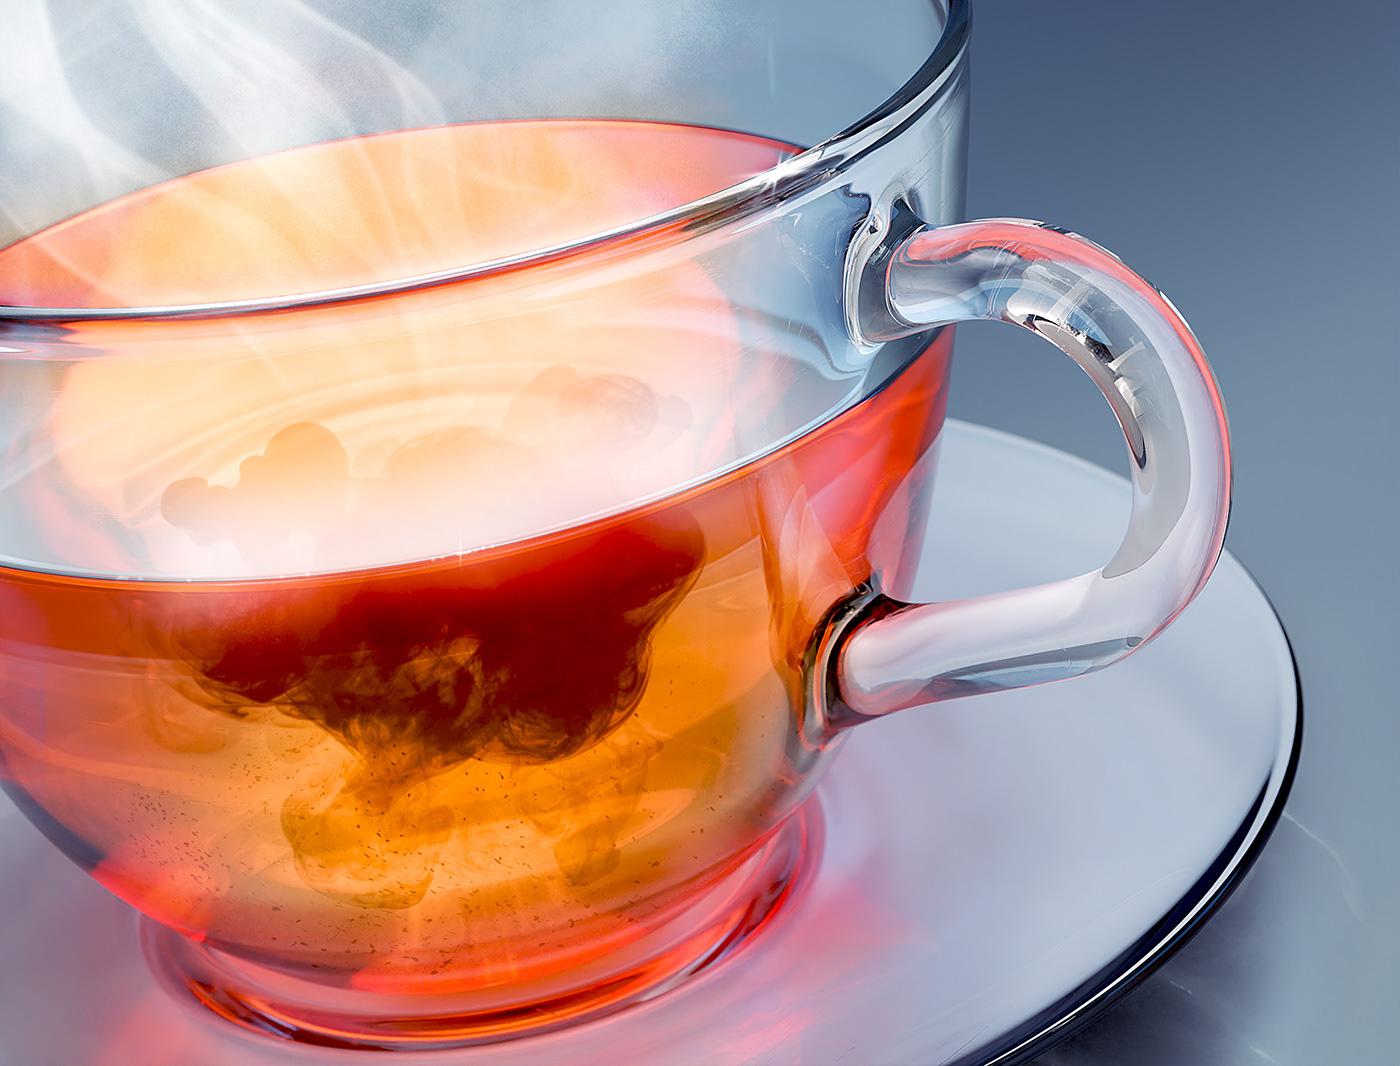 3D beverage blender caustics CGI drink Food  glass product tea